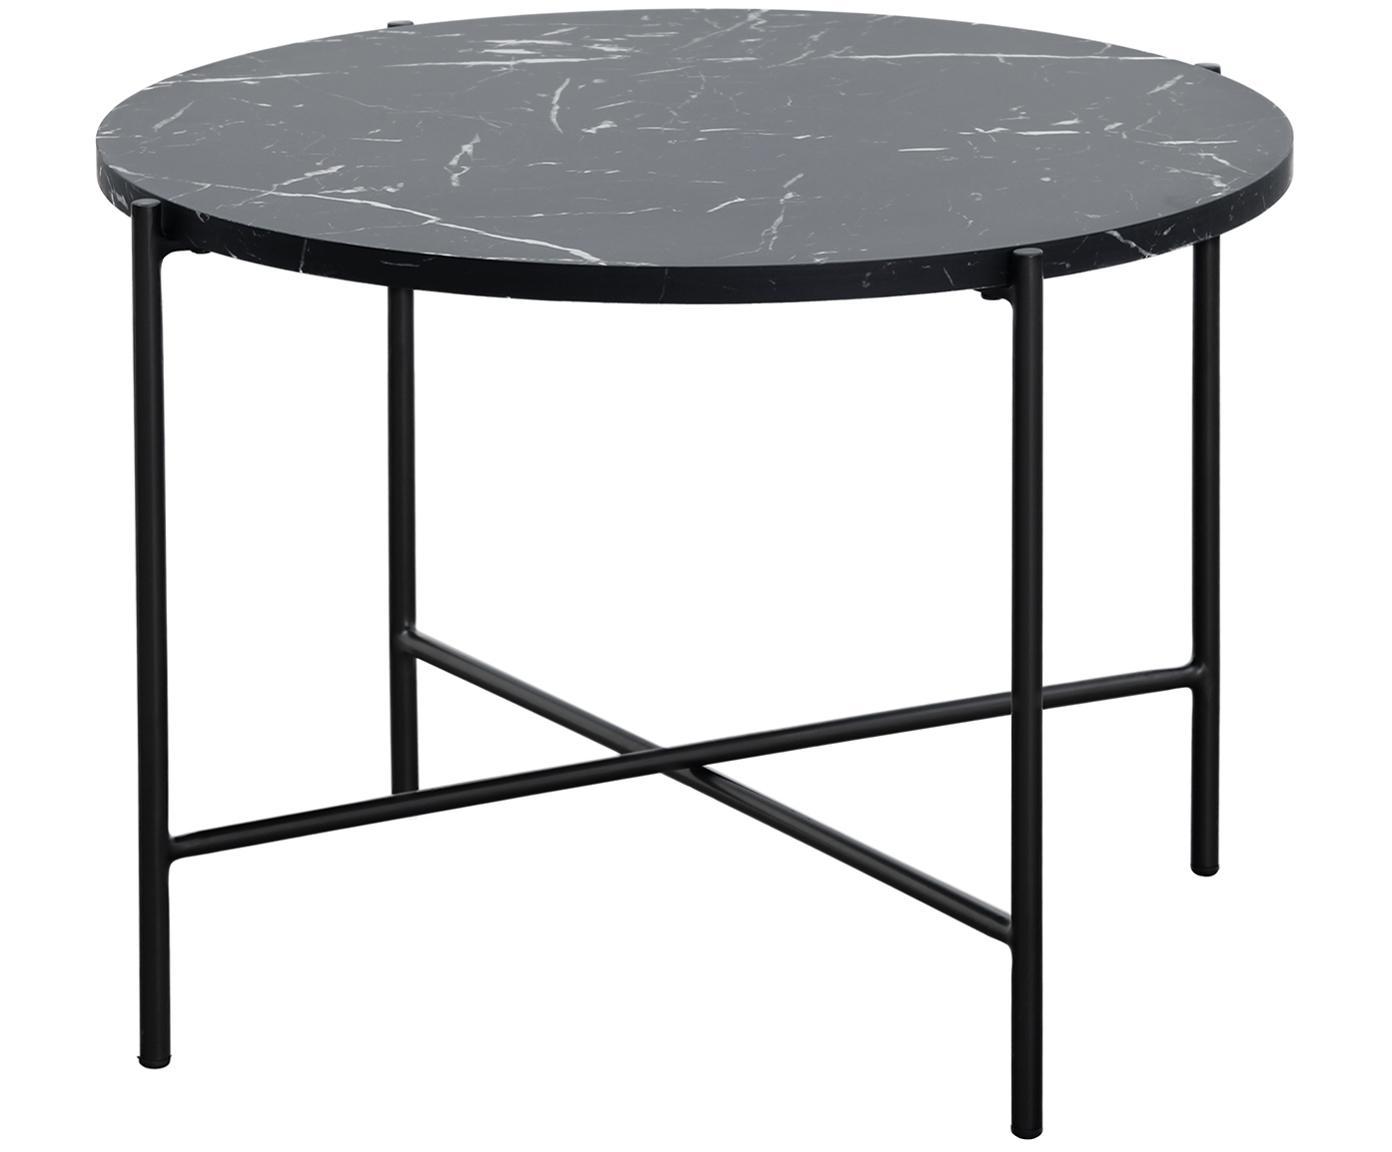 Salontafel Fria, Tafelblad: MDF, gecoat met gelakt pa, Frame: gepoedercoat metaal, Tafelblad: mat zwart, gemarmerd. Frame: mat zwart, Ø 60 x H 43 cm